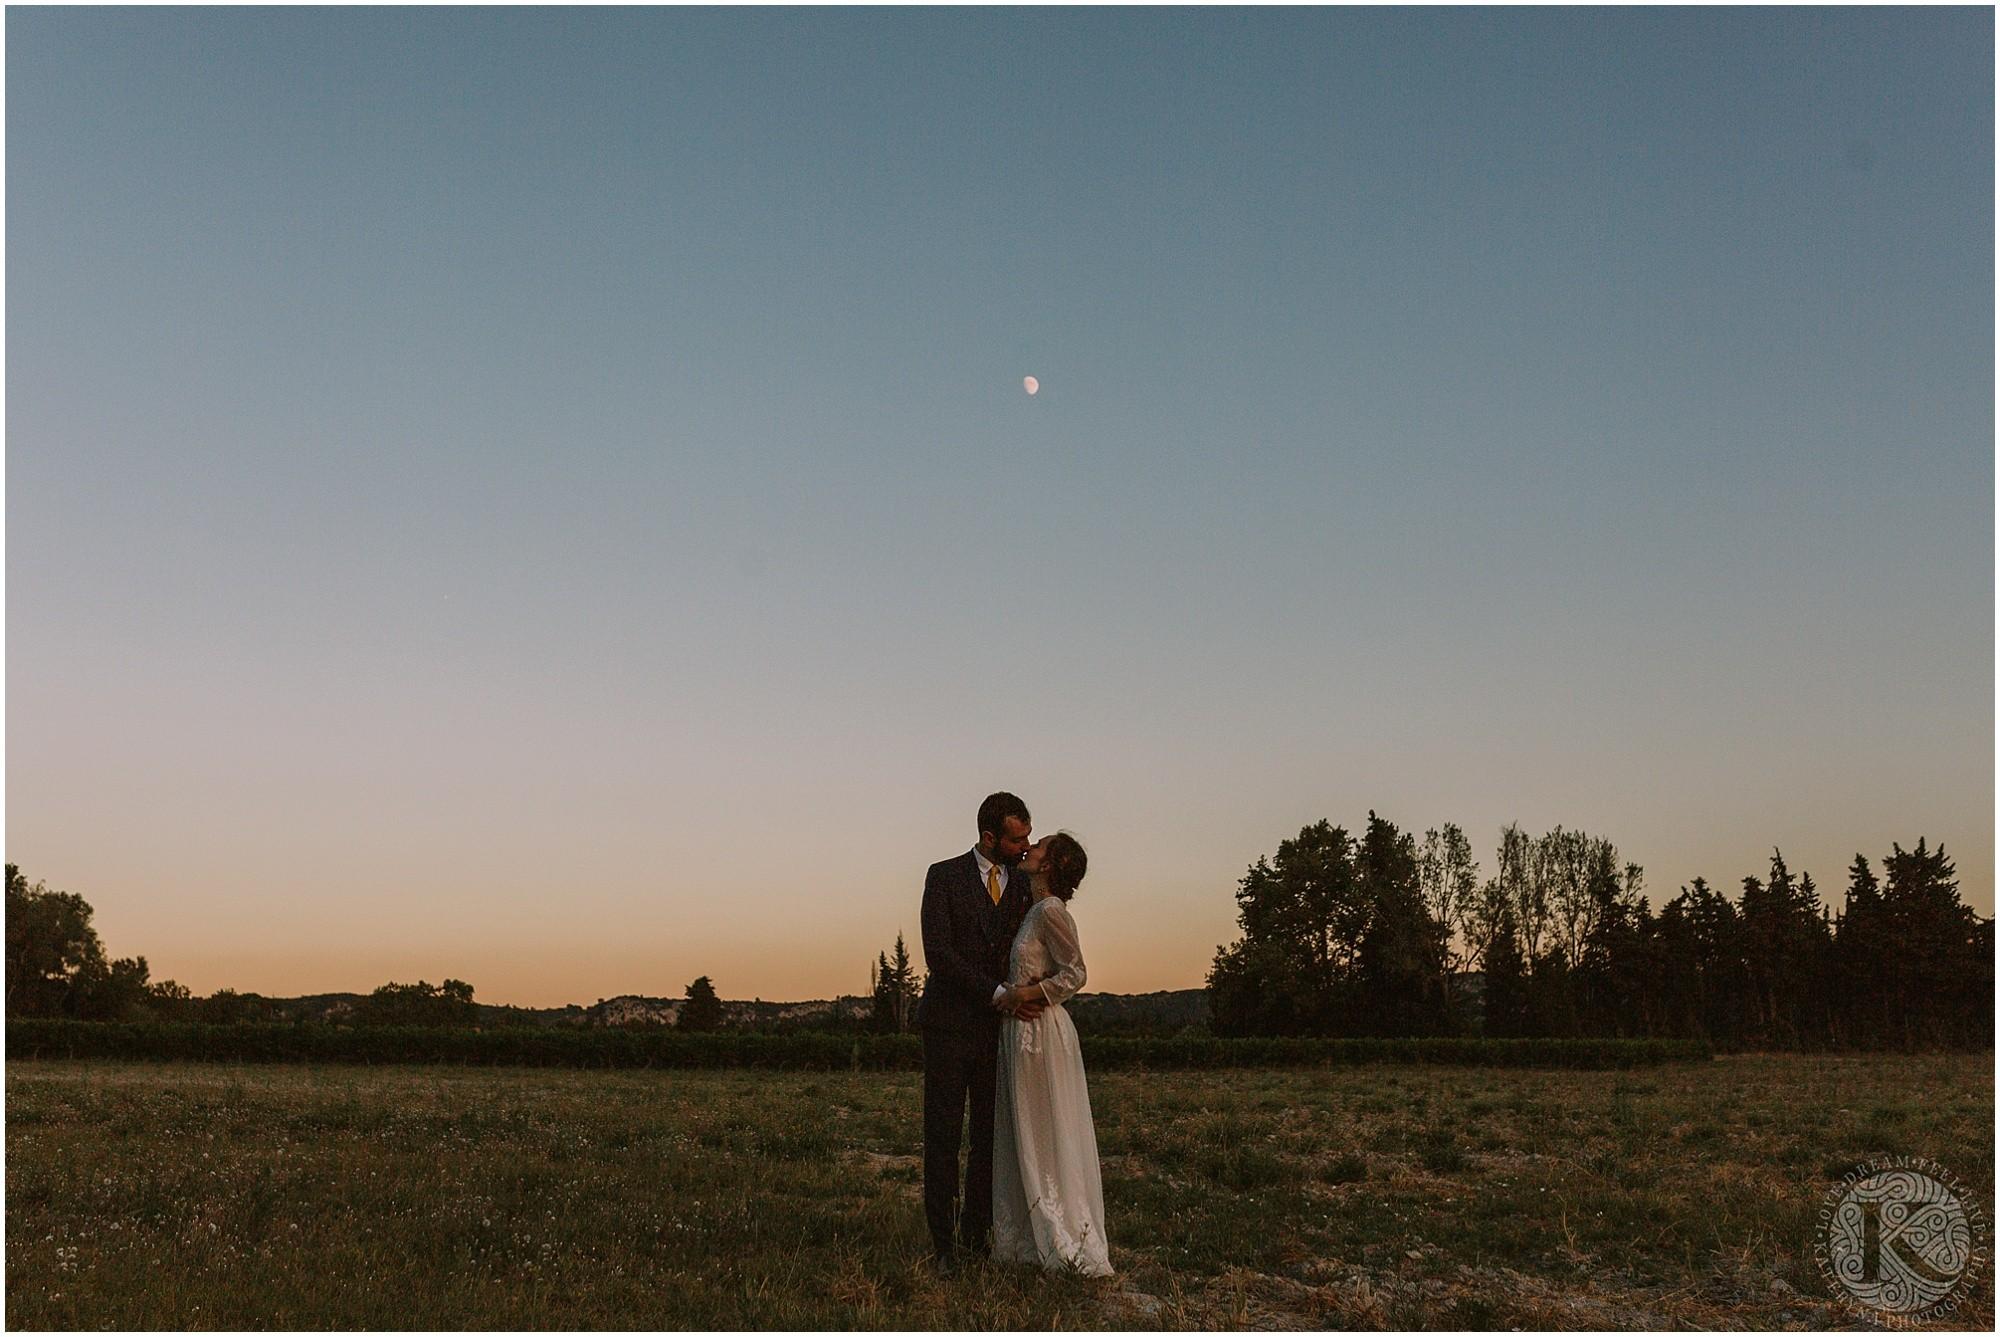 Kateryna-photos-photographe-mariage-vaucluse-provence-avignon-ferme-st-hugues_0072.jpg